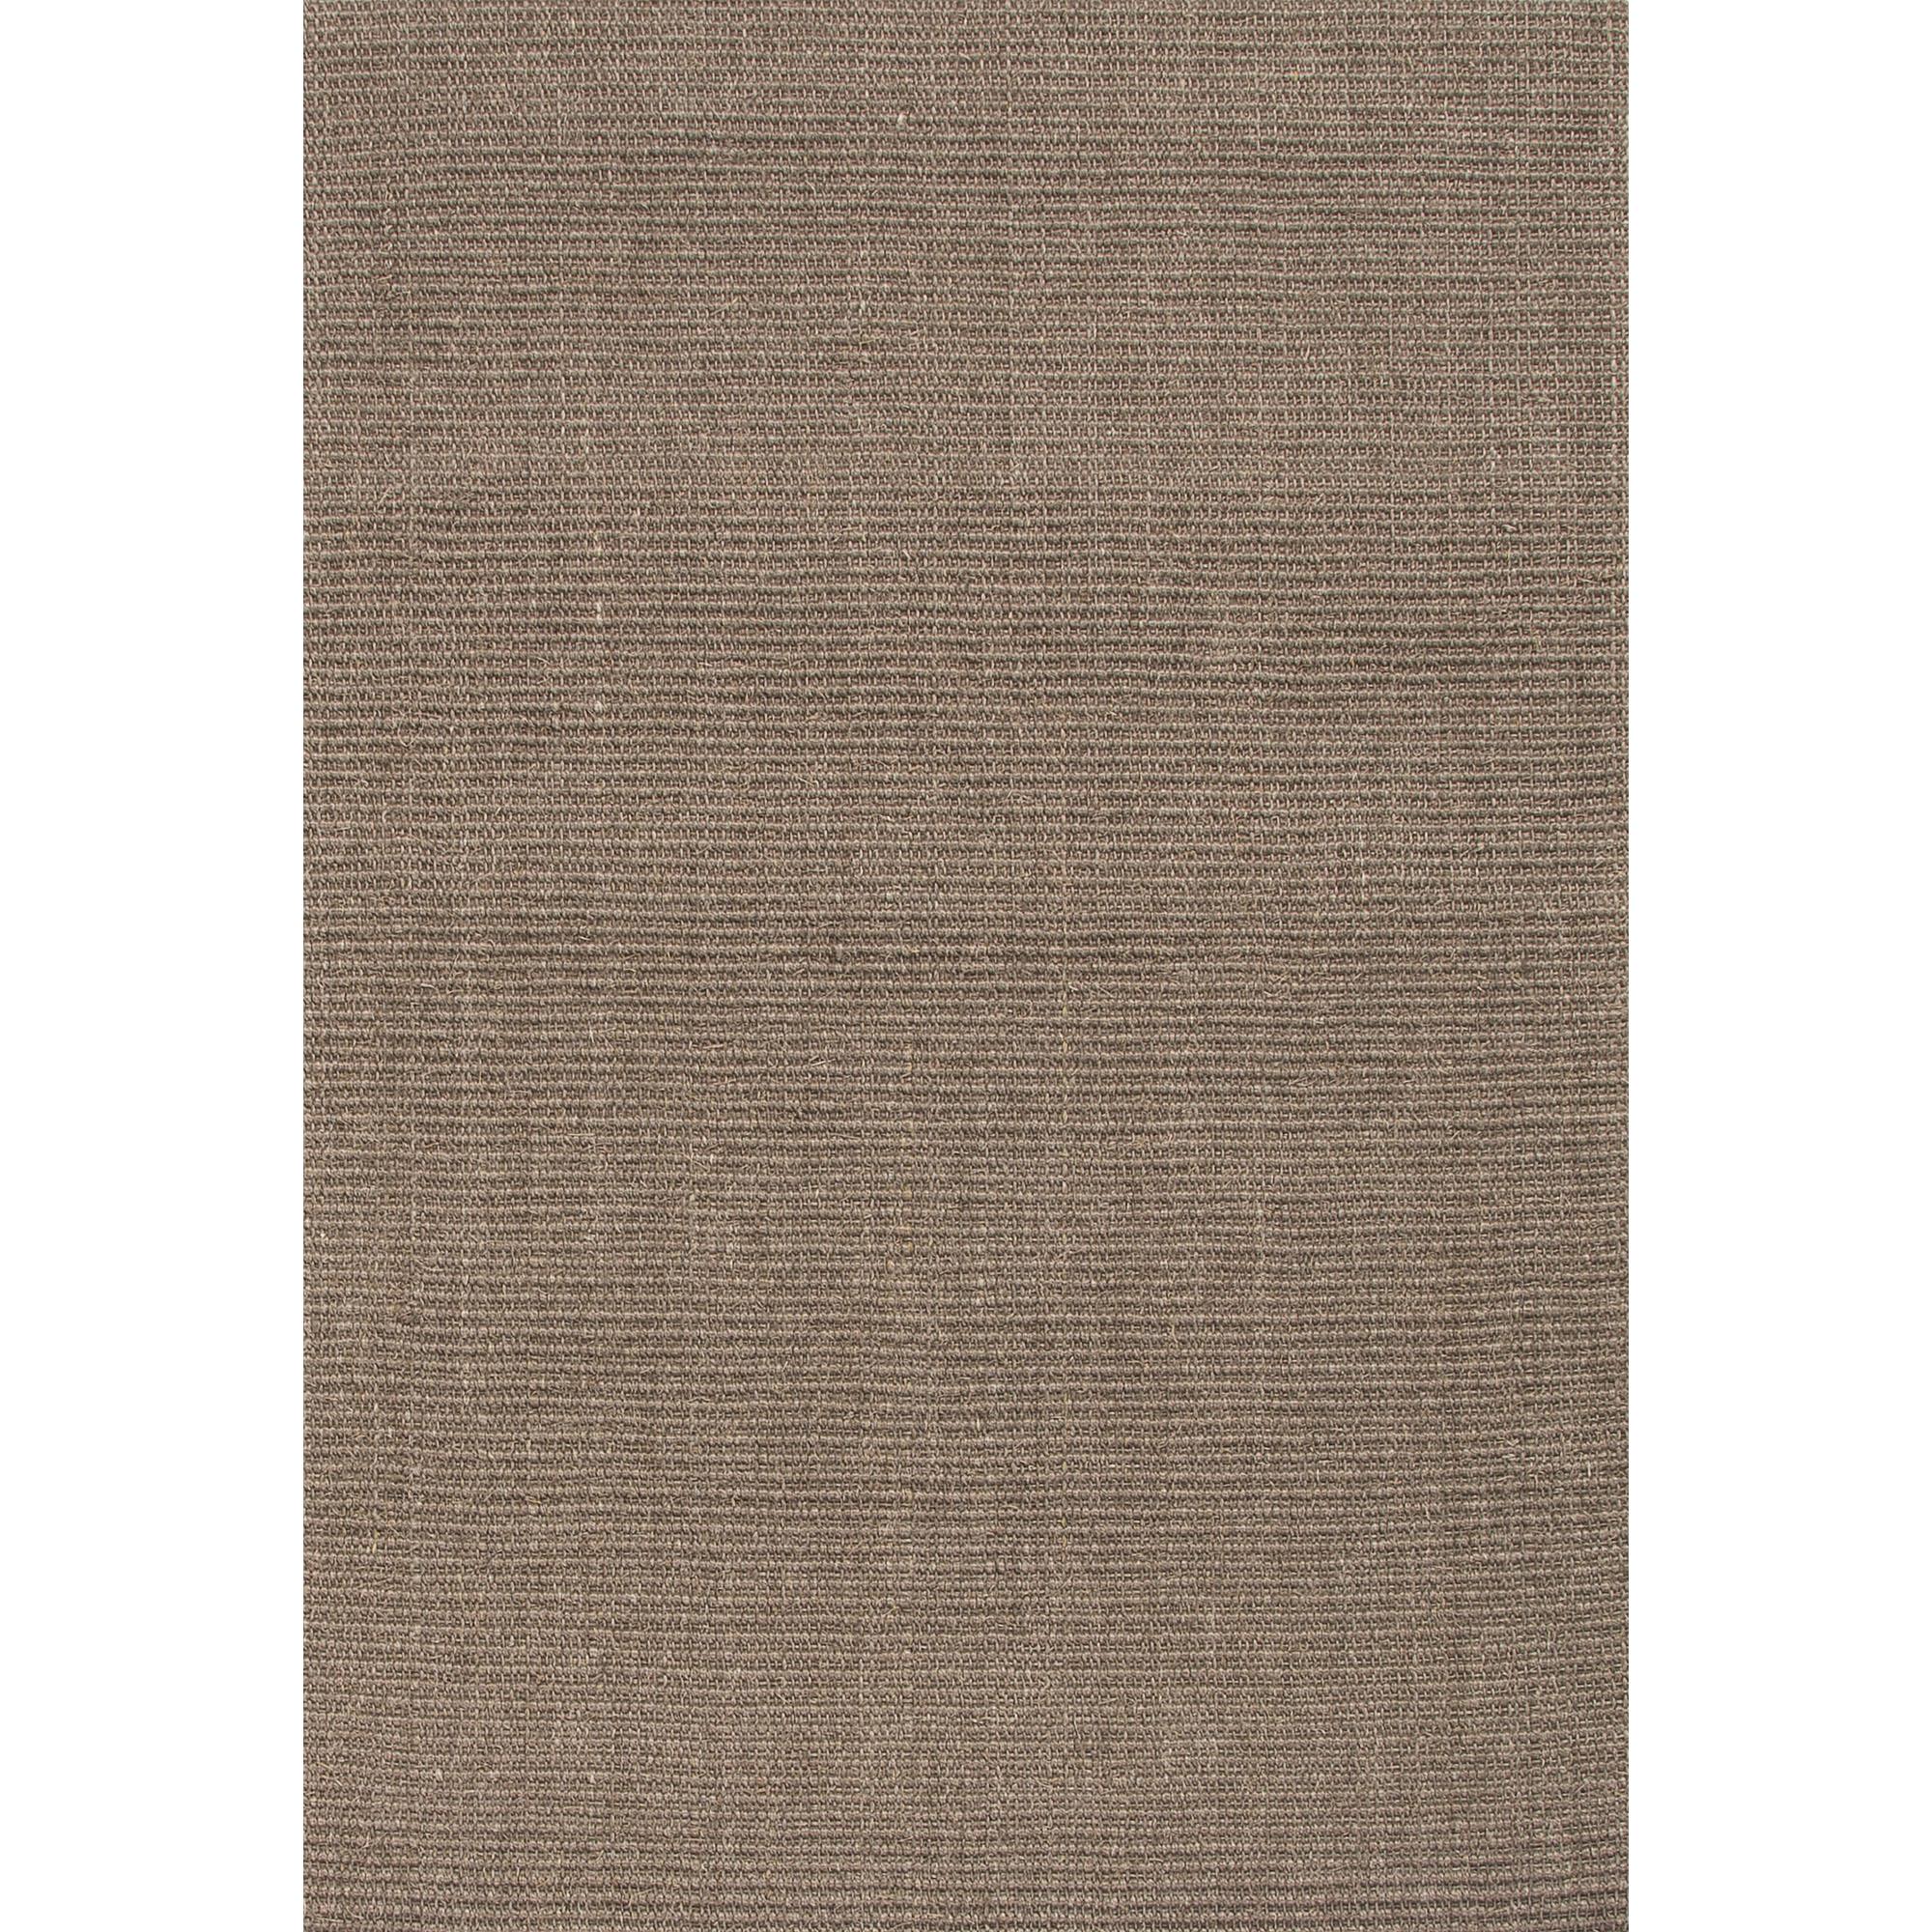 JAIPUR Rugs Naturals Sanibel 9 x 12 Rug - Item Number: RUG119146